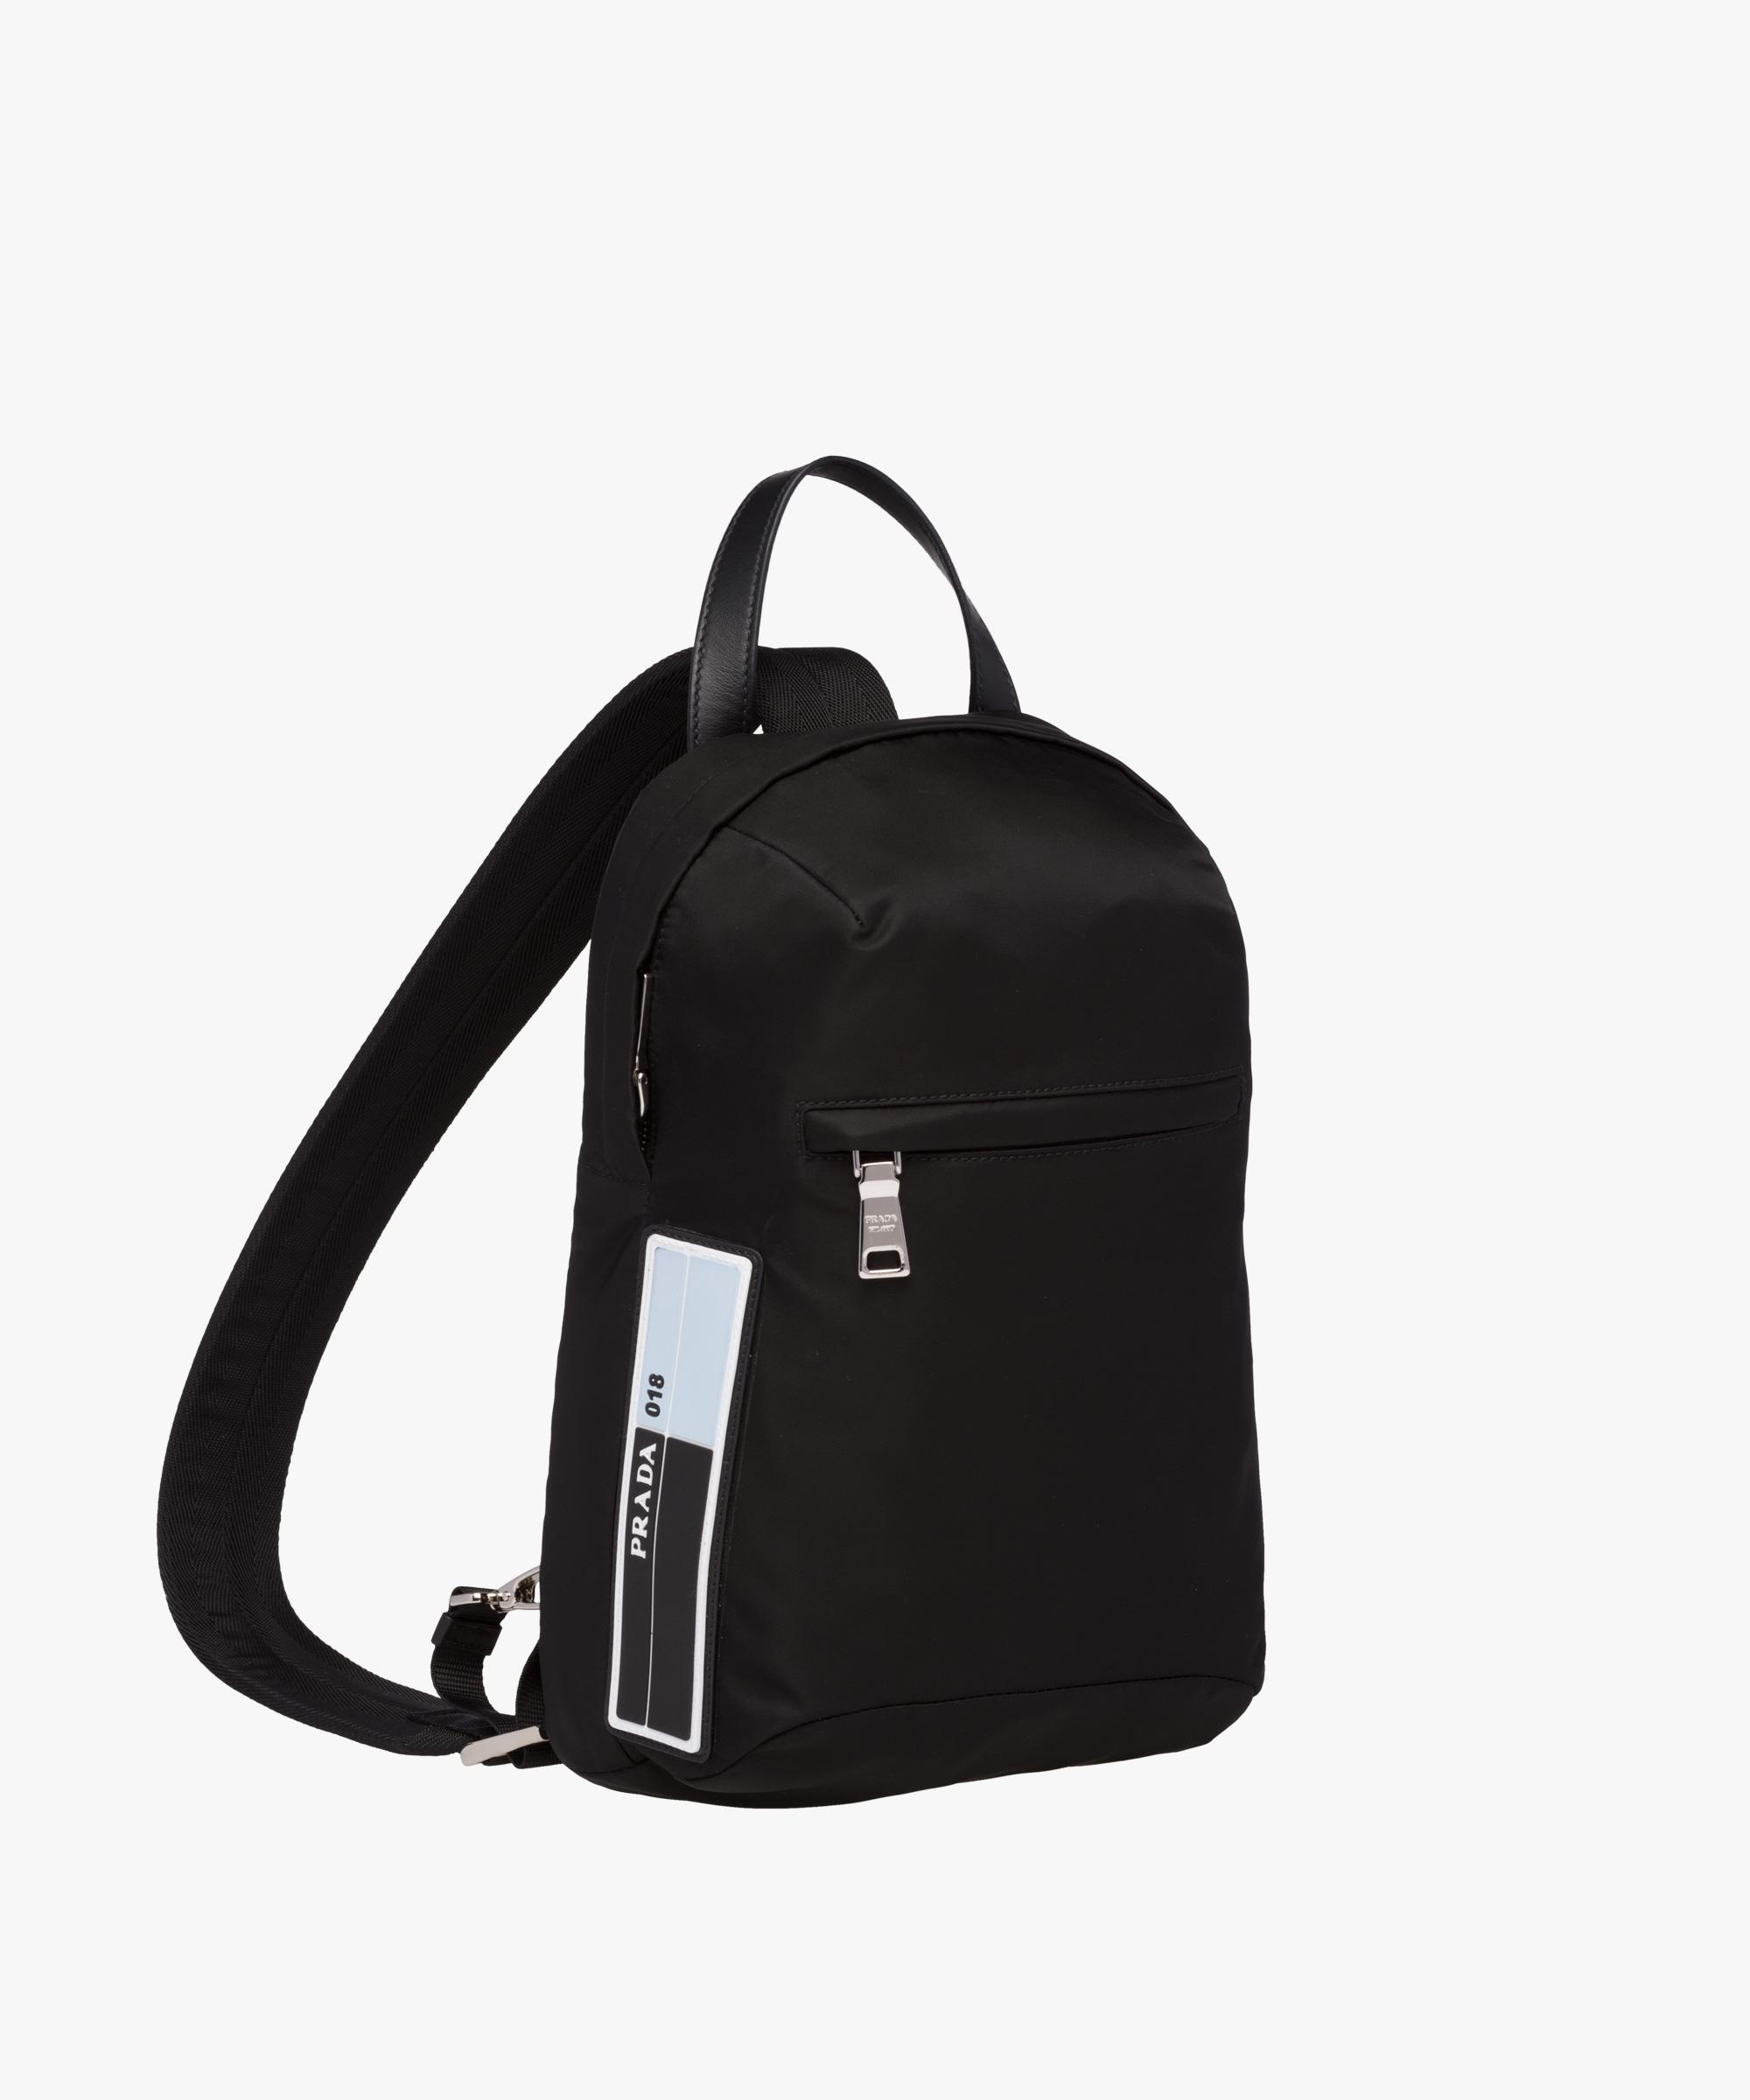 9a0a98e69094 Prada Nylon One-shoulder Backpack in Black for Men - Lyst